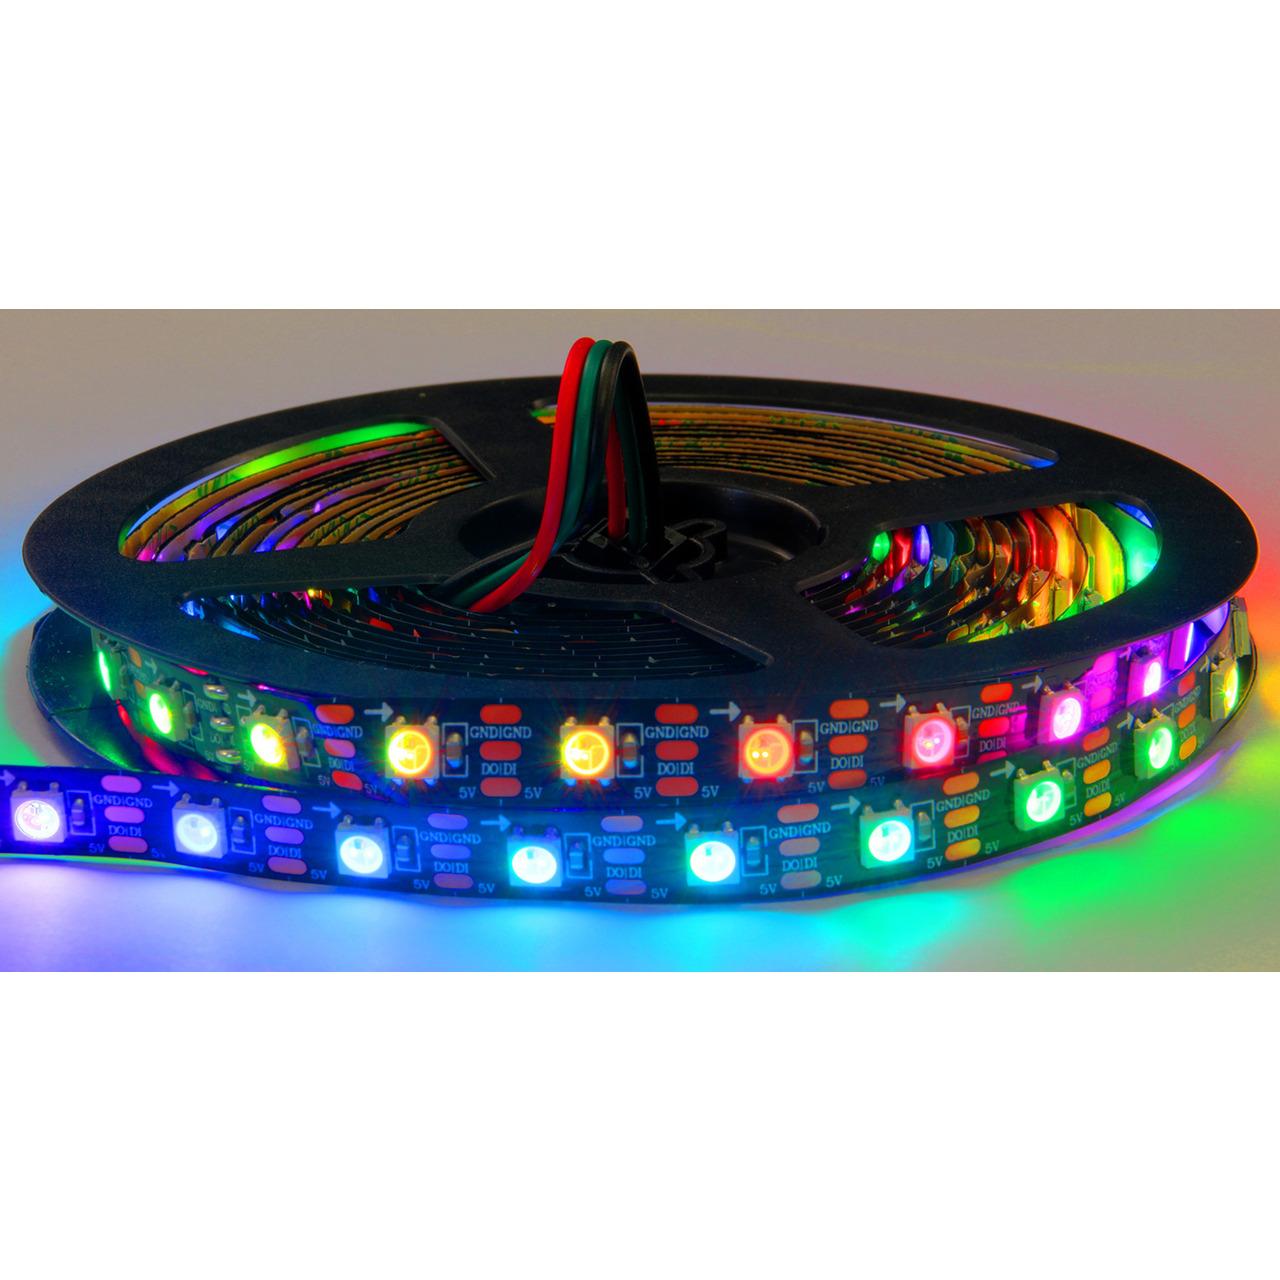 Diamex 4-m-LED-Streifen mit WS2812-kompatiblen-LEDs- 60 LEDs-m- schwarze Platine